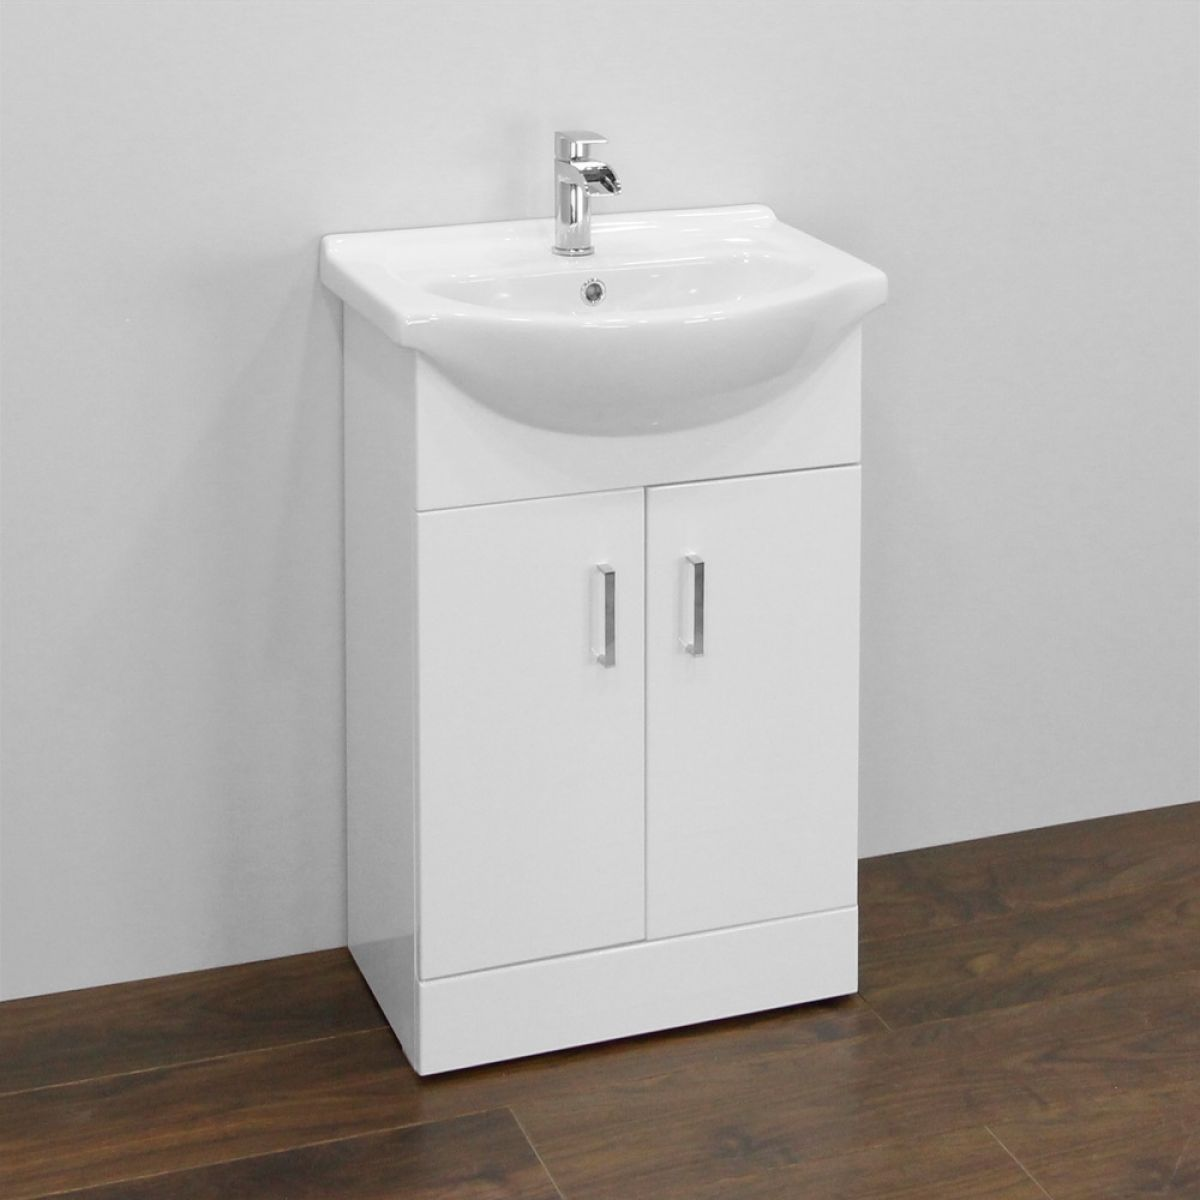 Premier High Gloss White Vanity Unit 550mm